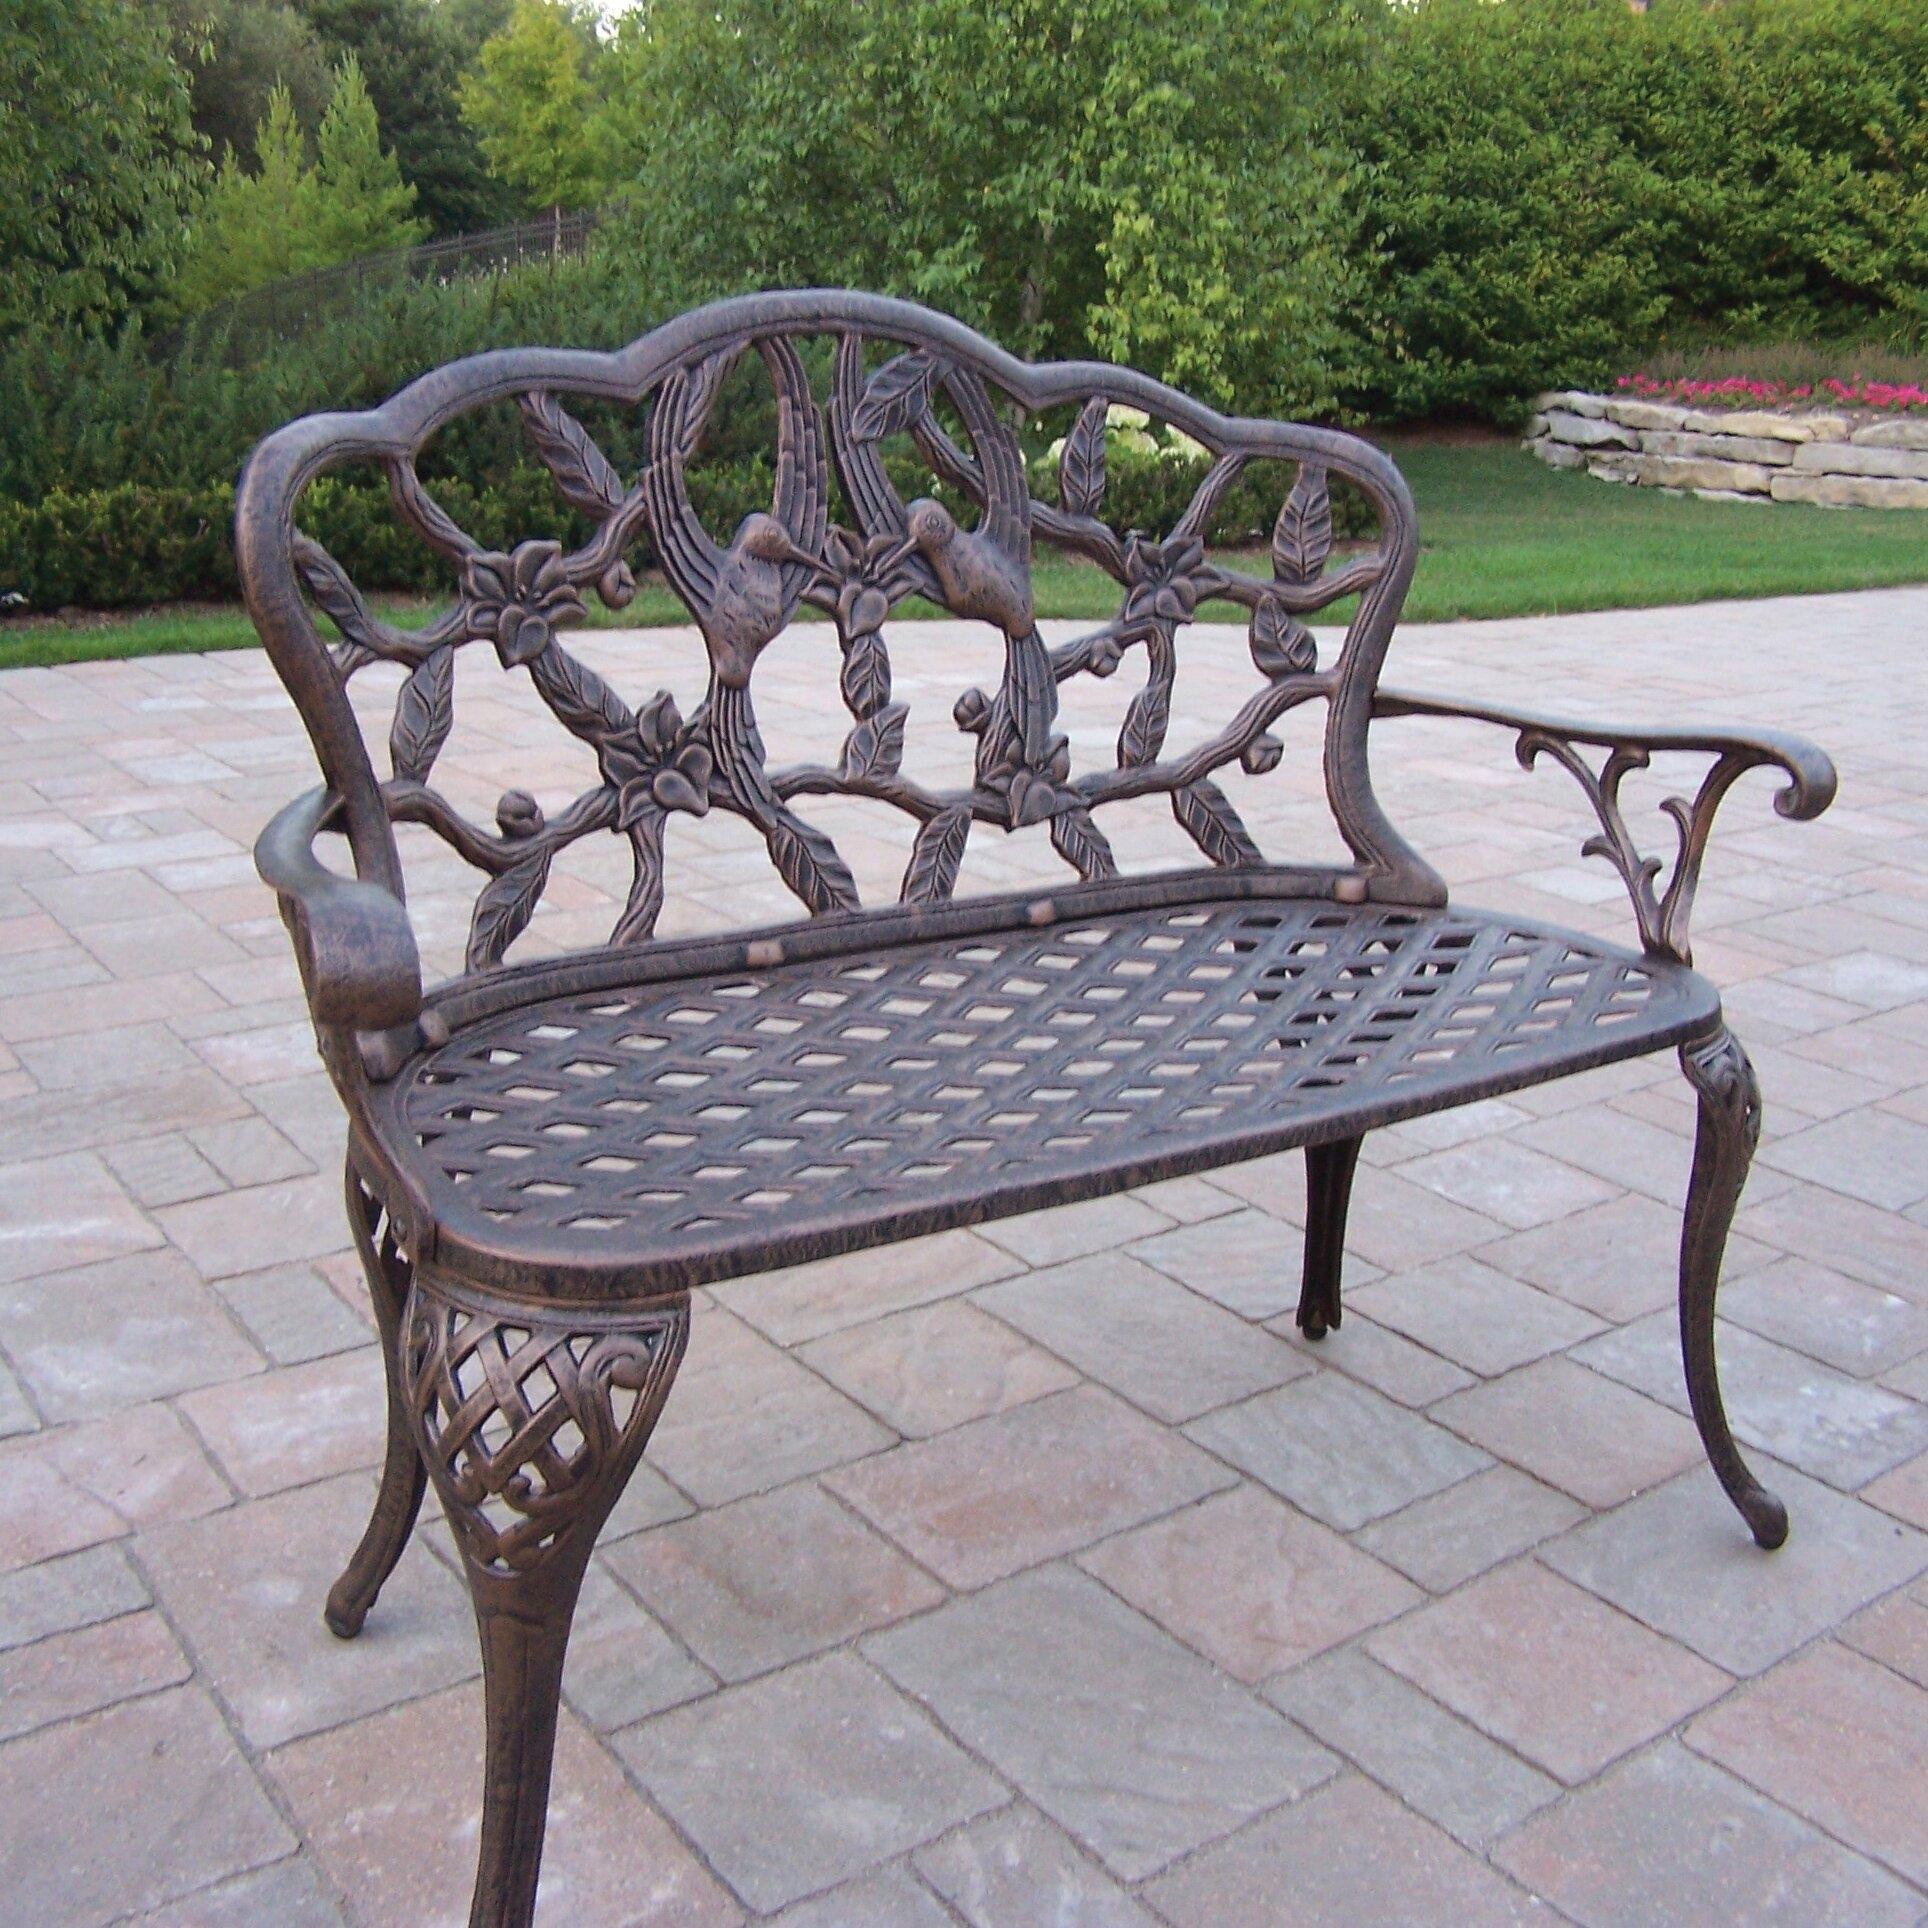 Delightful Garden Bench For Sale